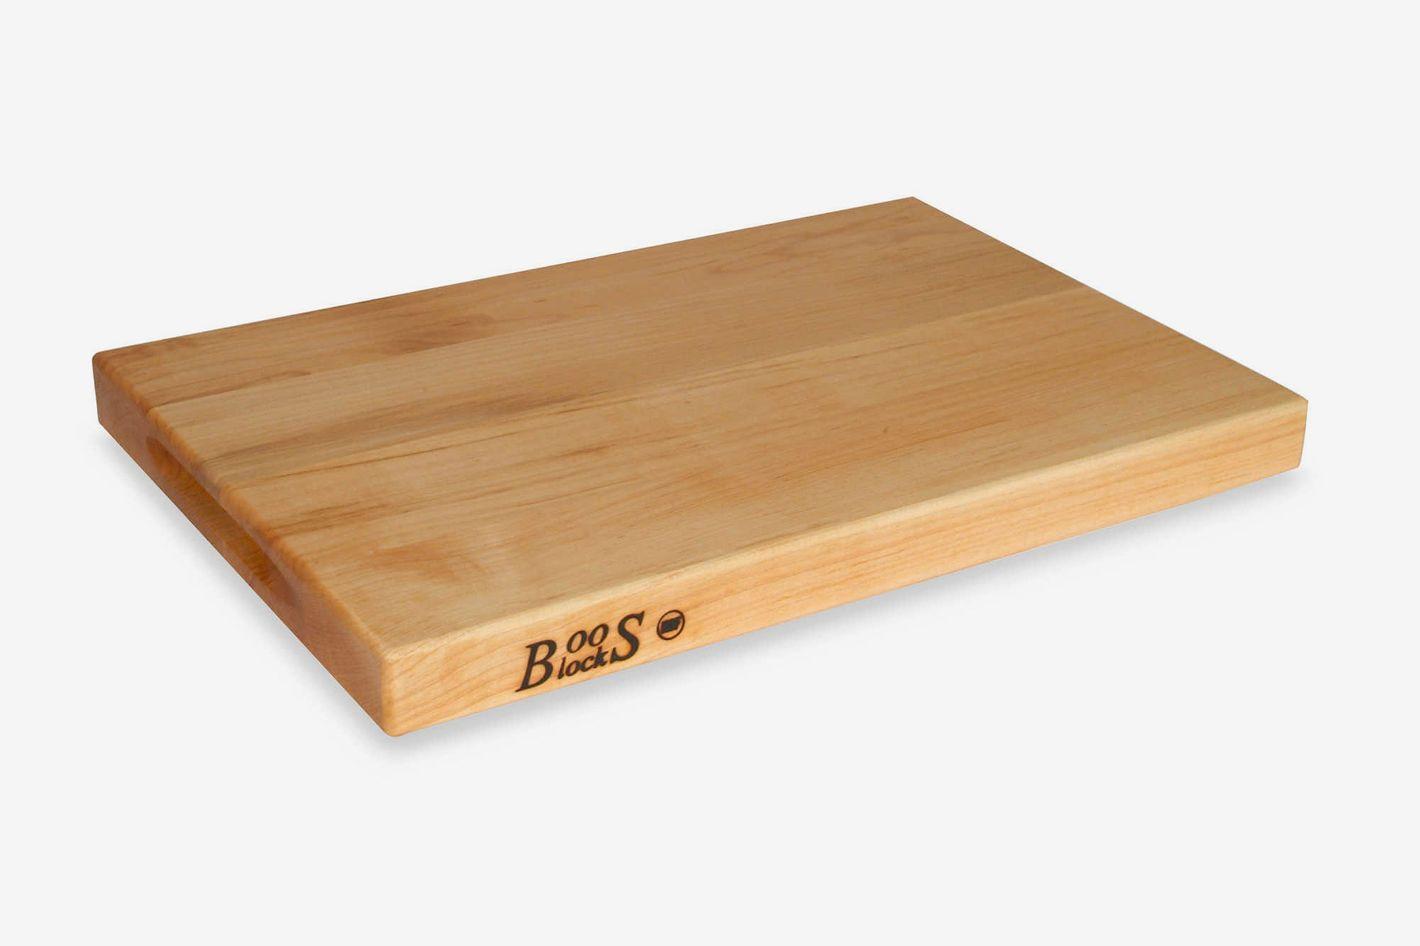 John Boos 18-Inch x 12-Inch Reversible Cutting Board